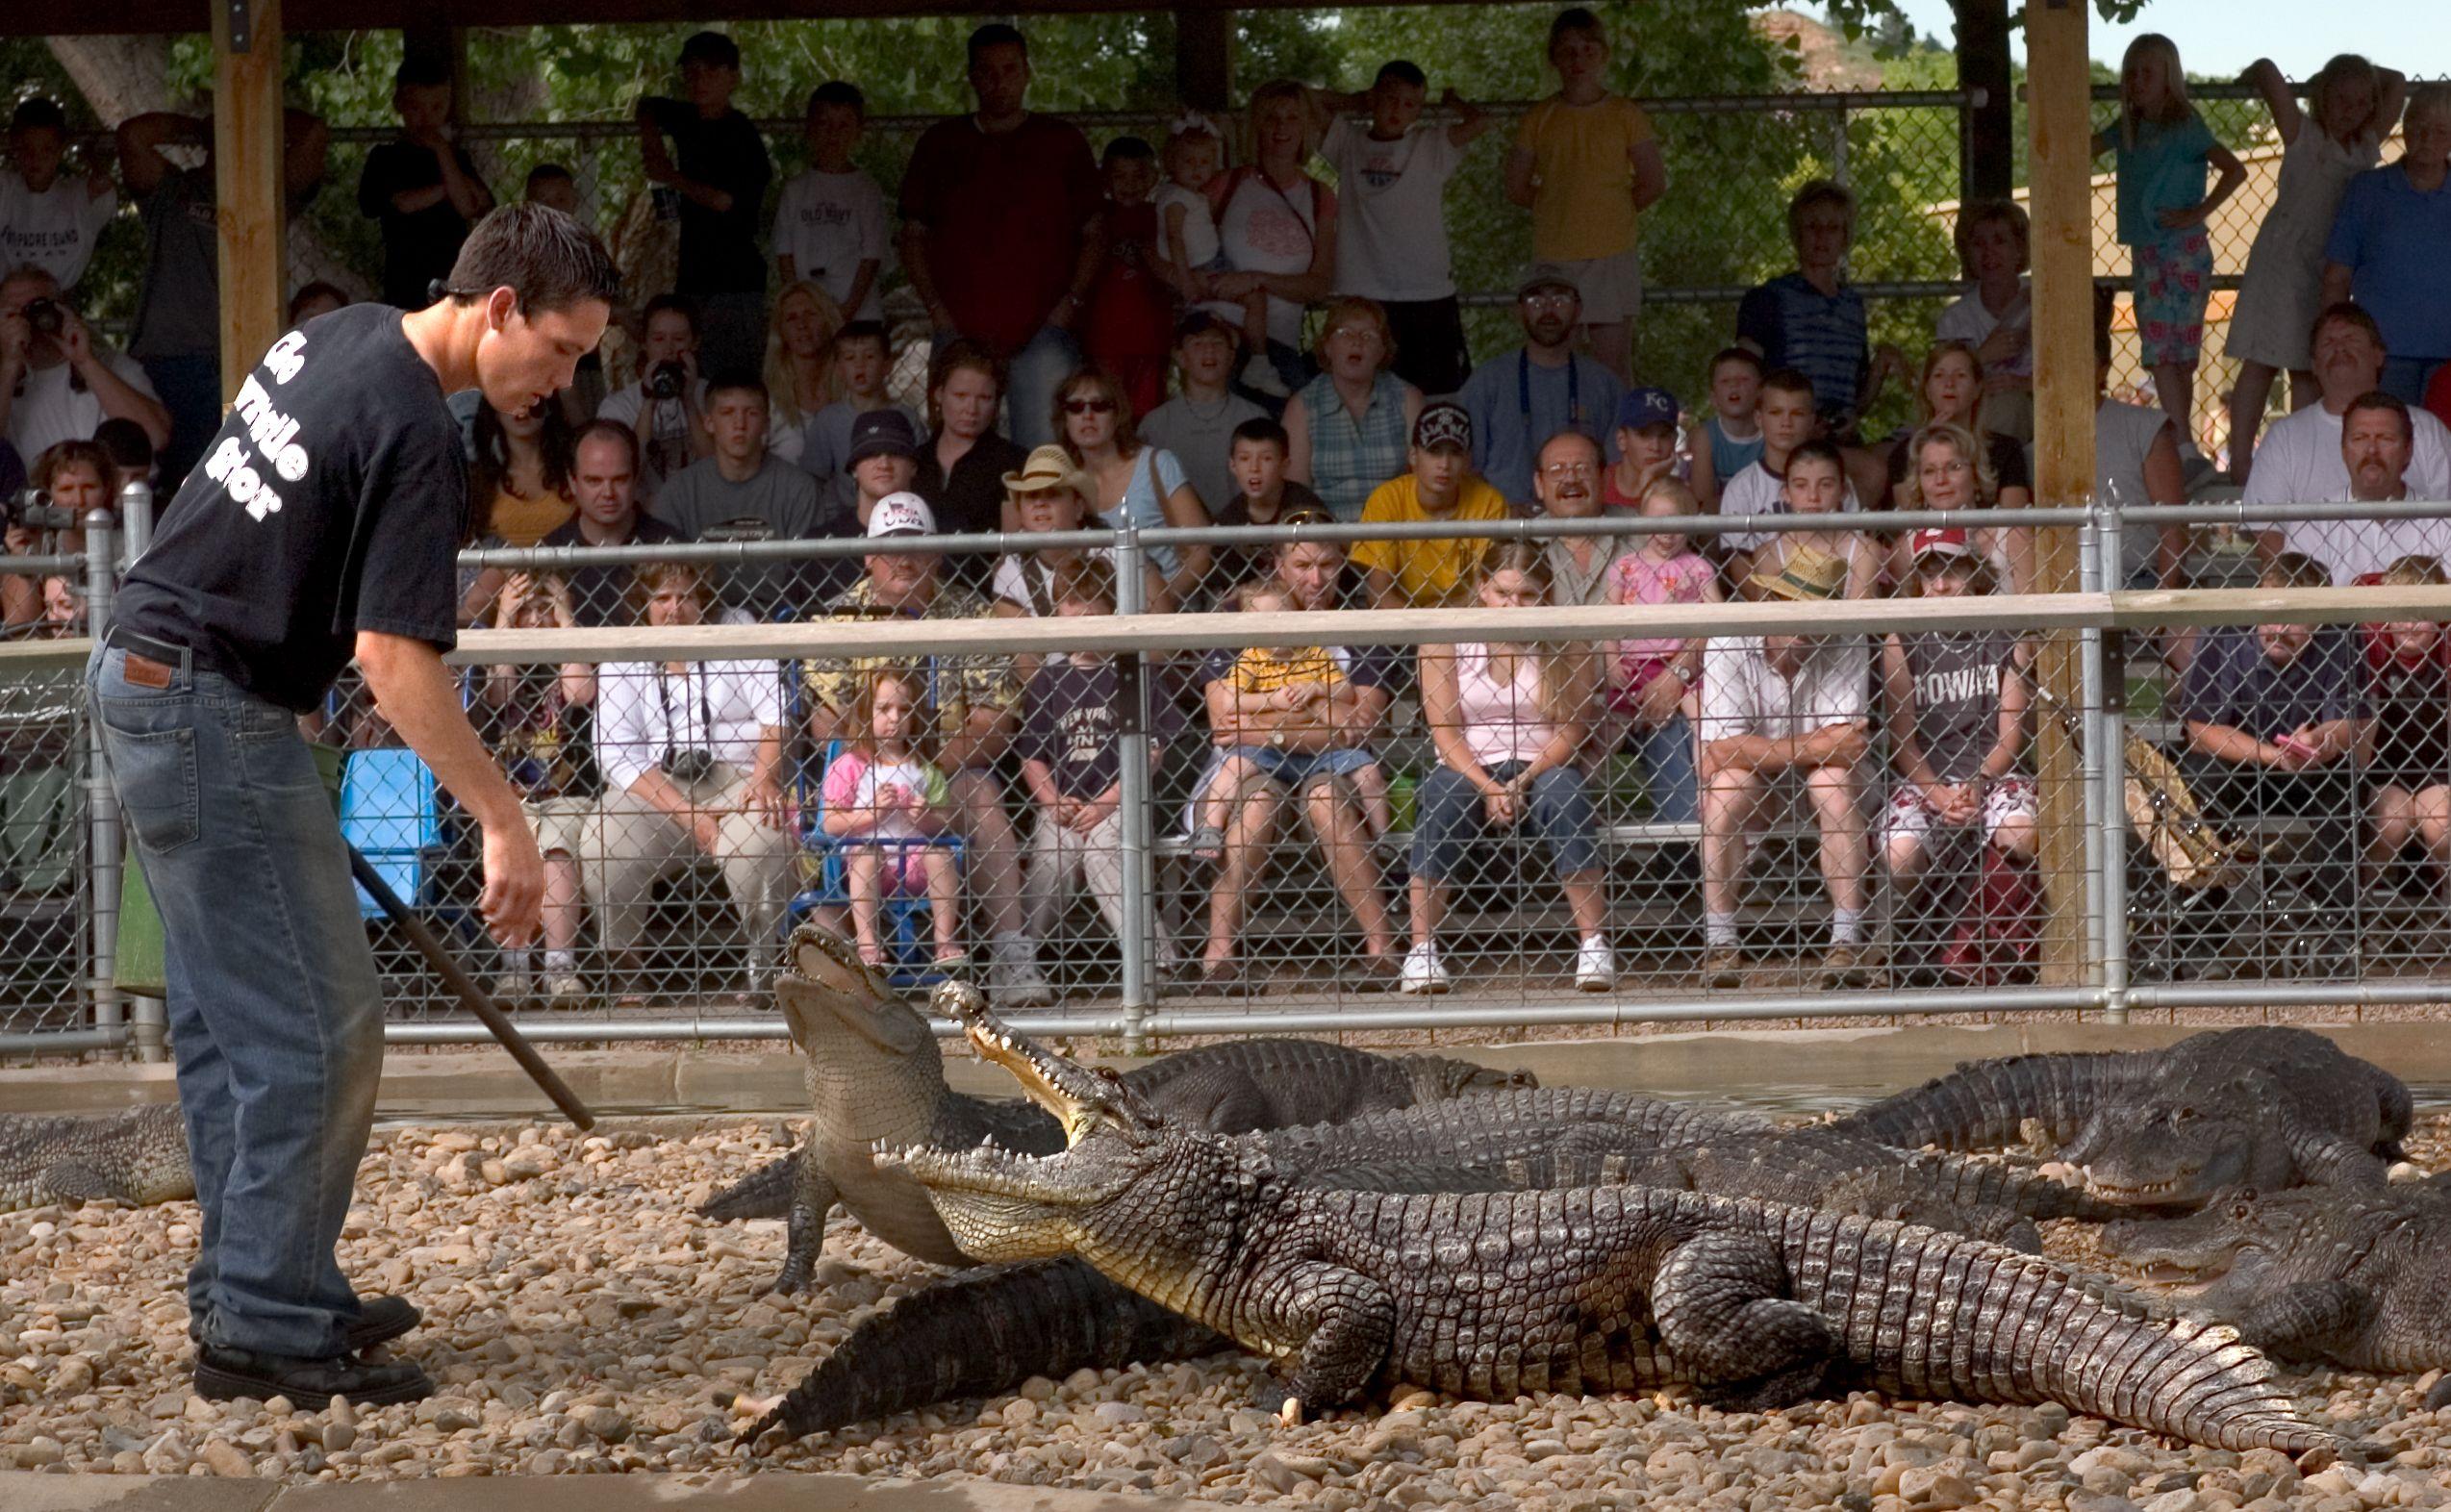 117b8c596251b5938e3eaf4850cdab76 - How Long Does Reptile Gardens Take